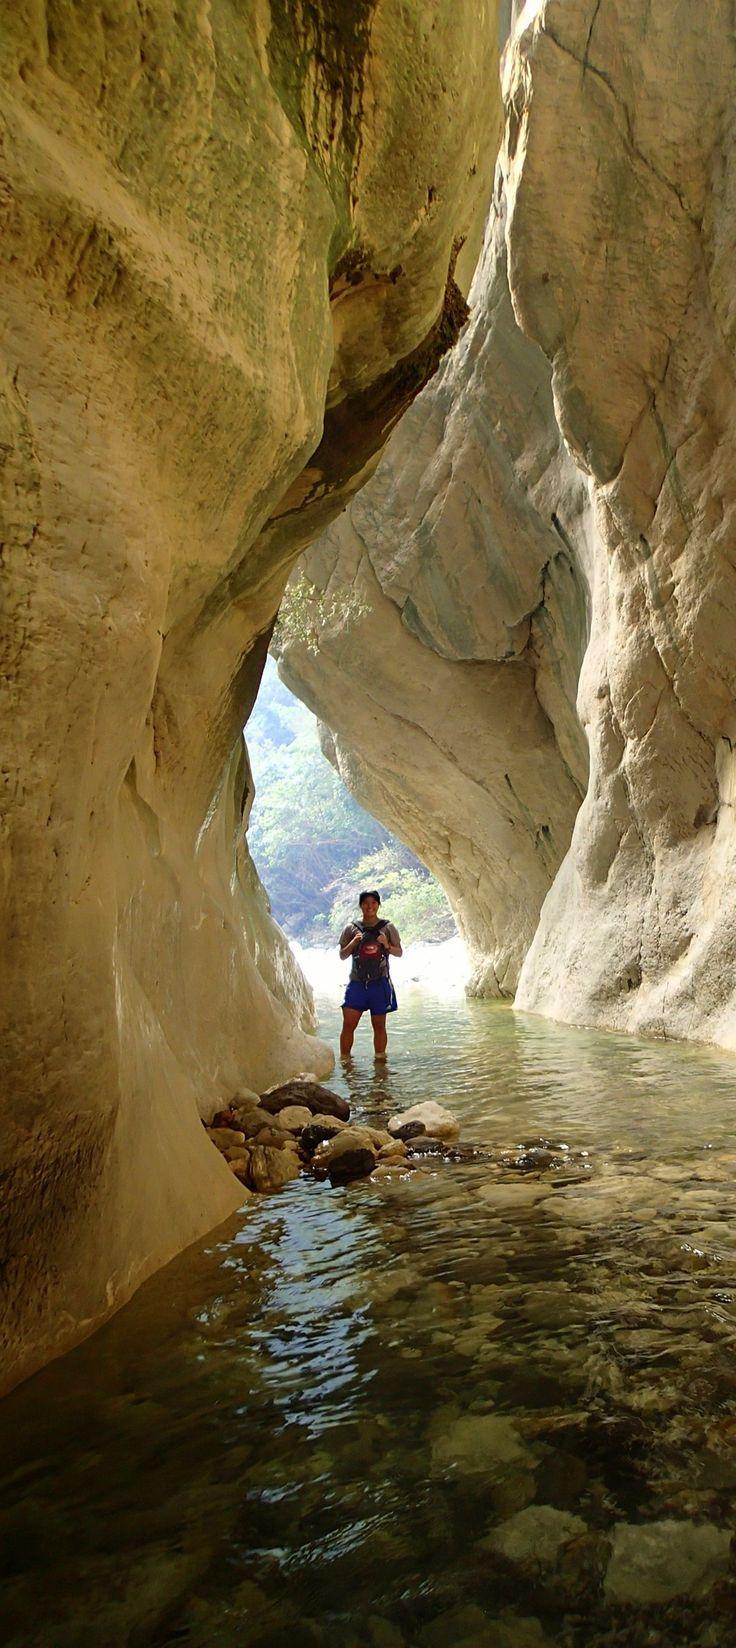 Sawcut Gorge - Isolated Hill Route, Marlborough, NEW ZEALAND